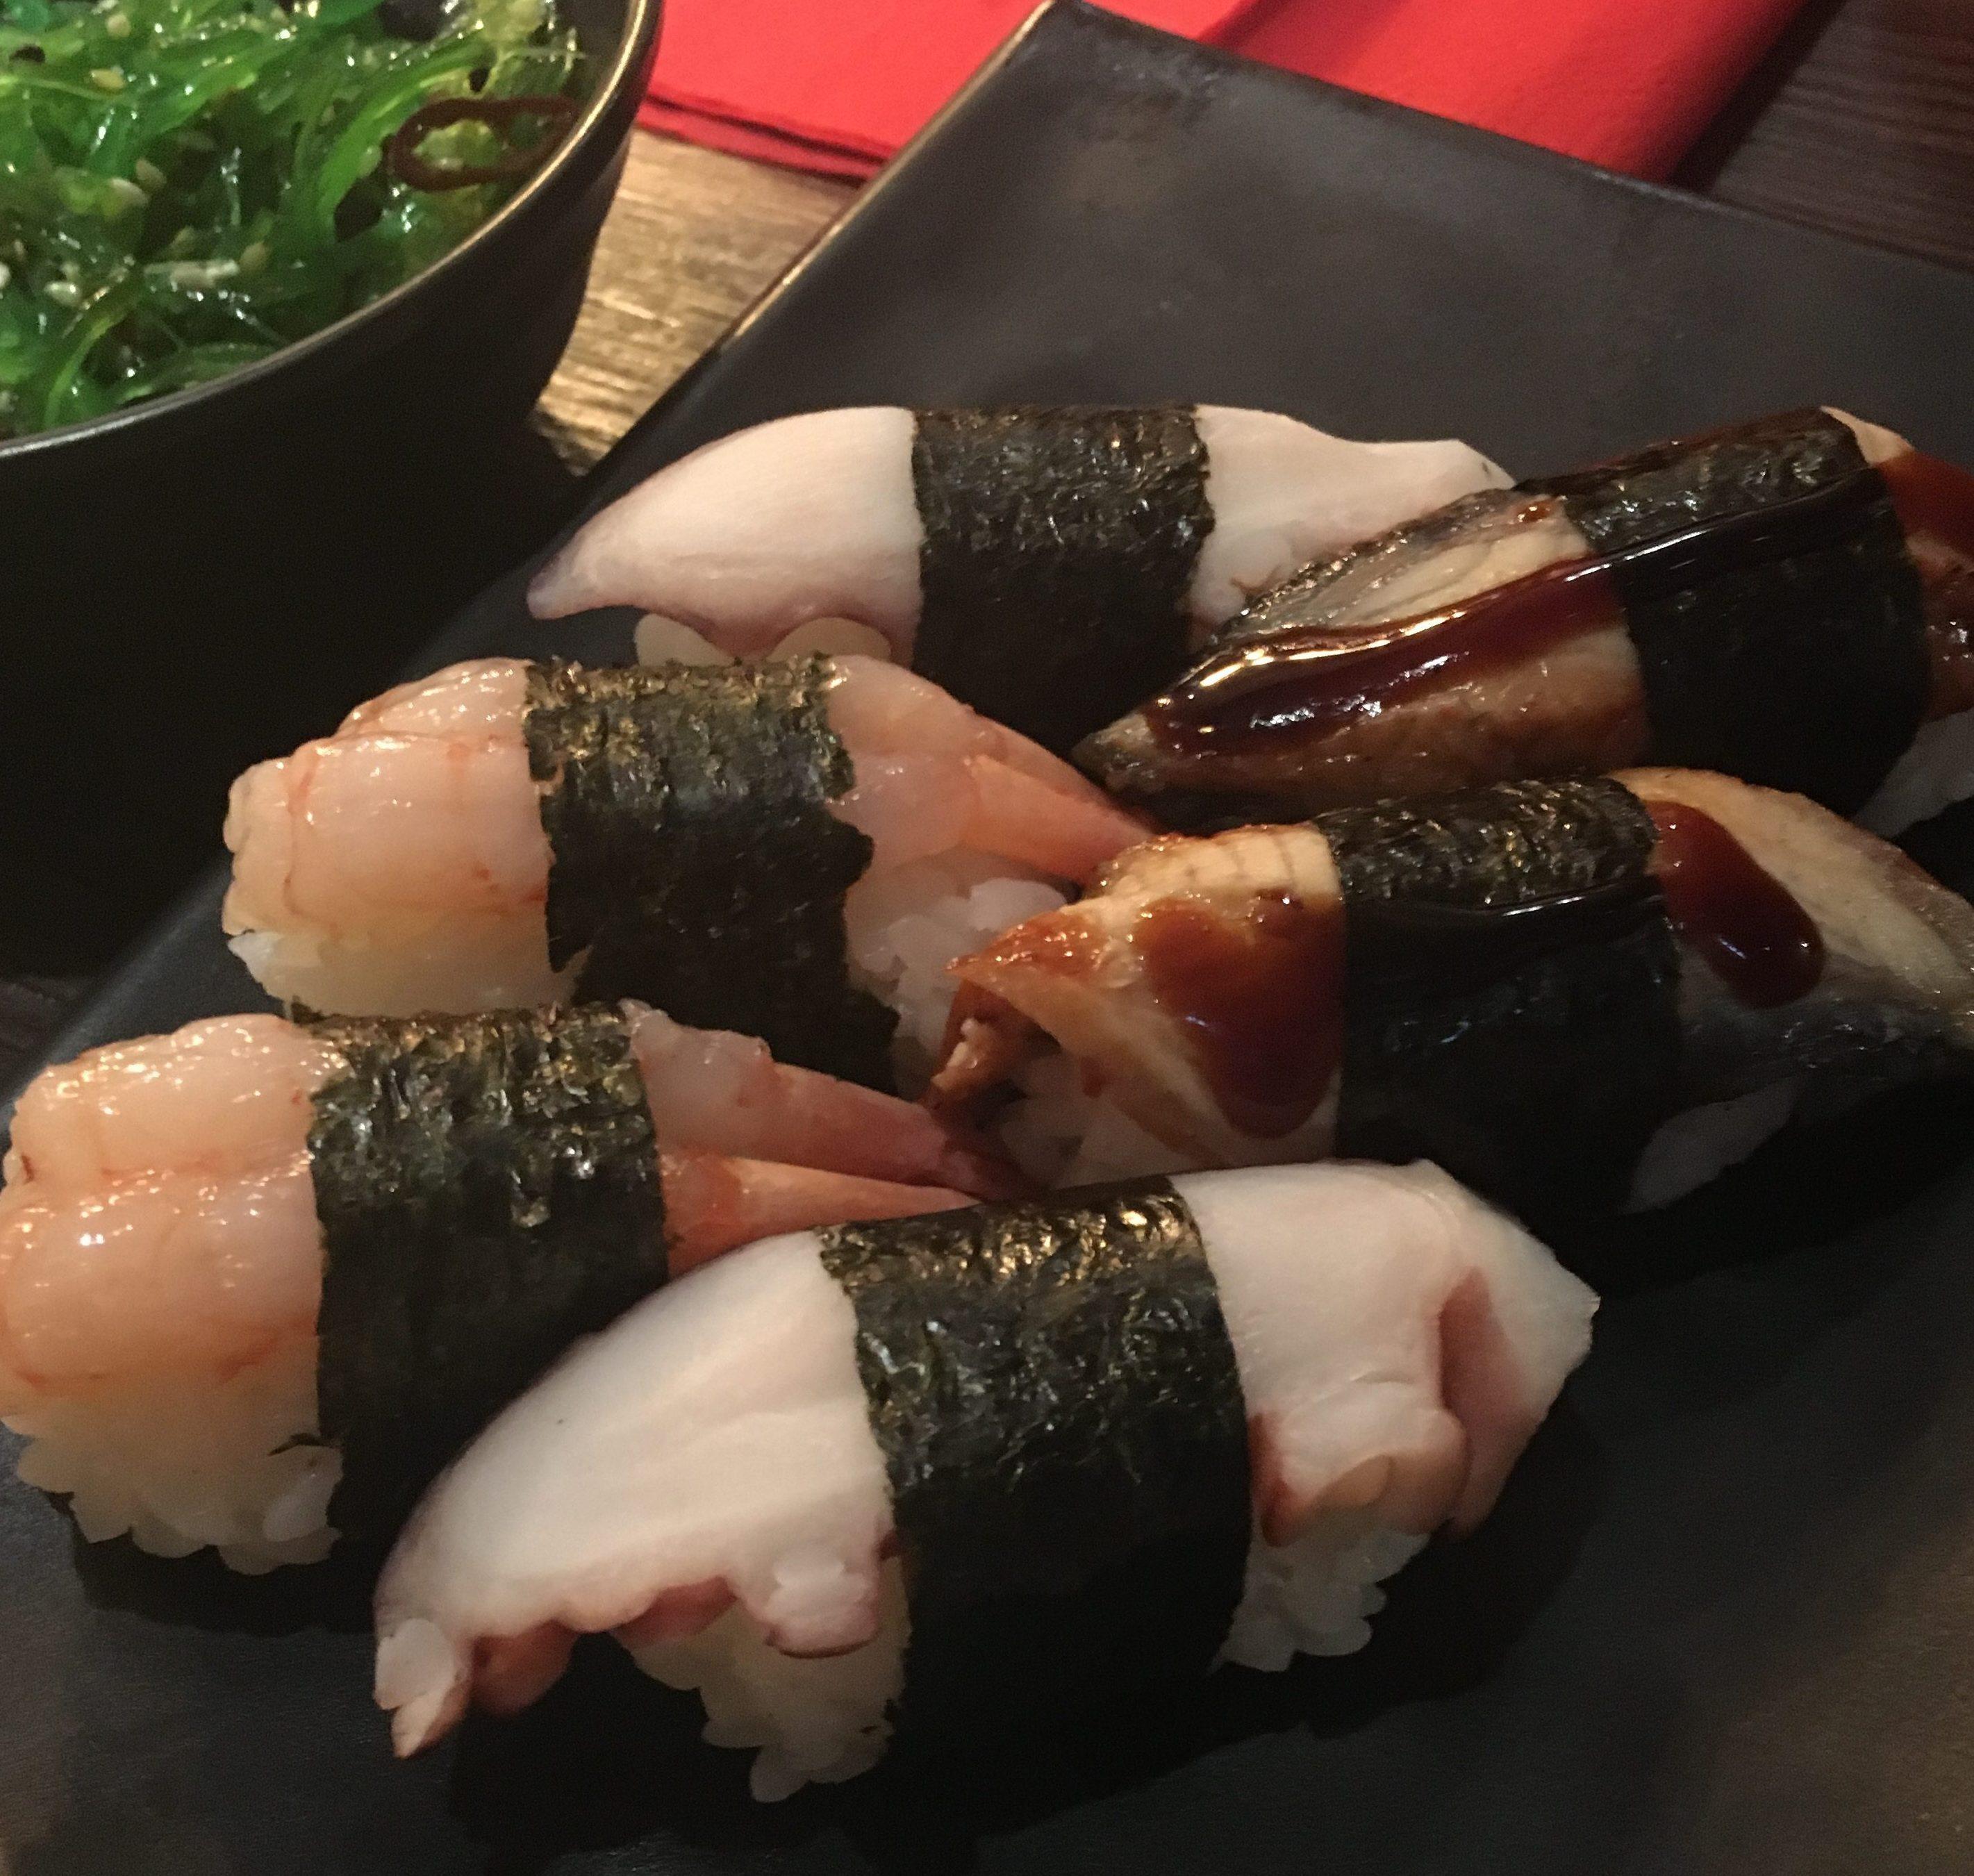 Sushi-mania indeed